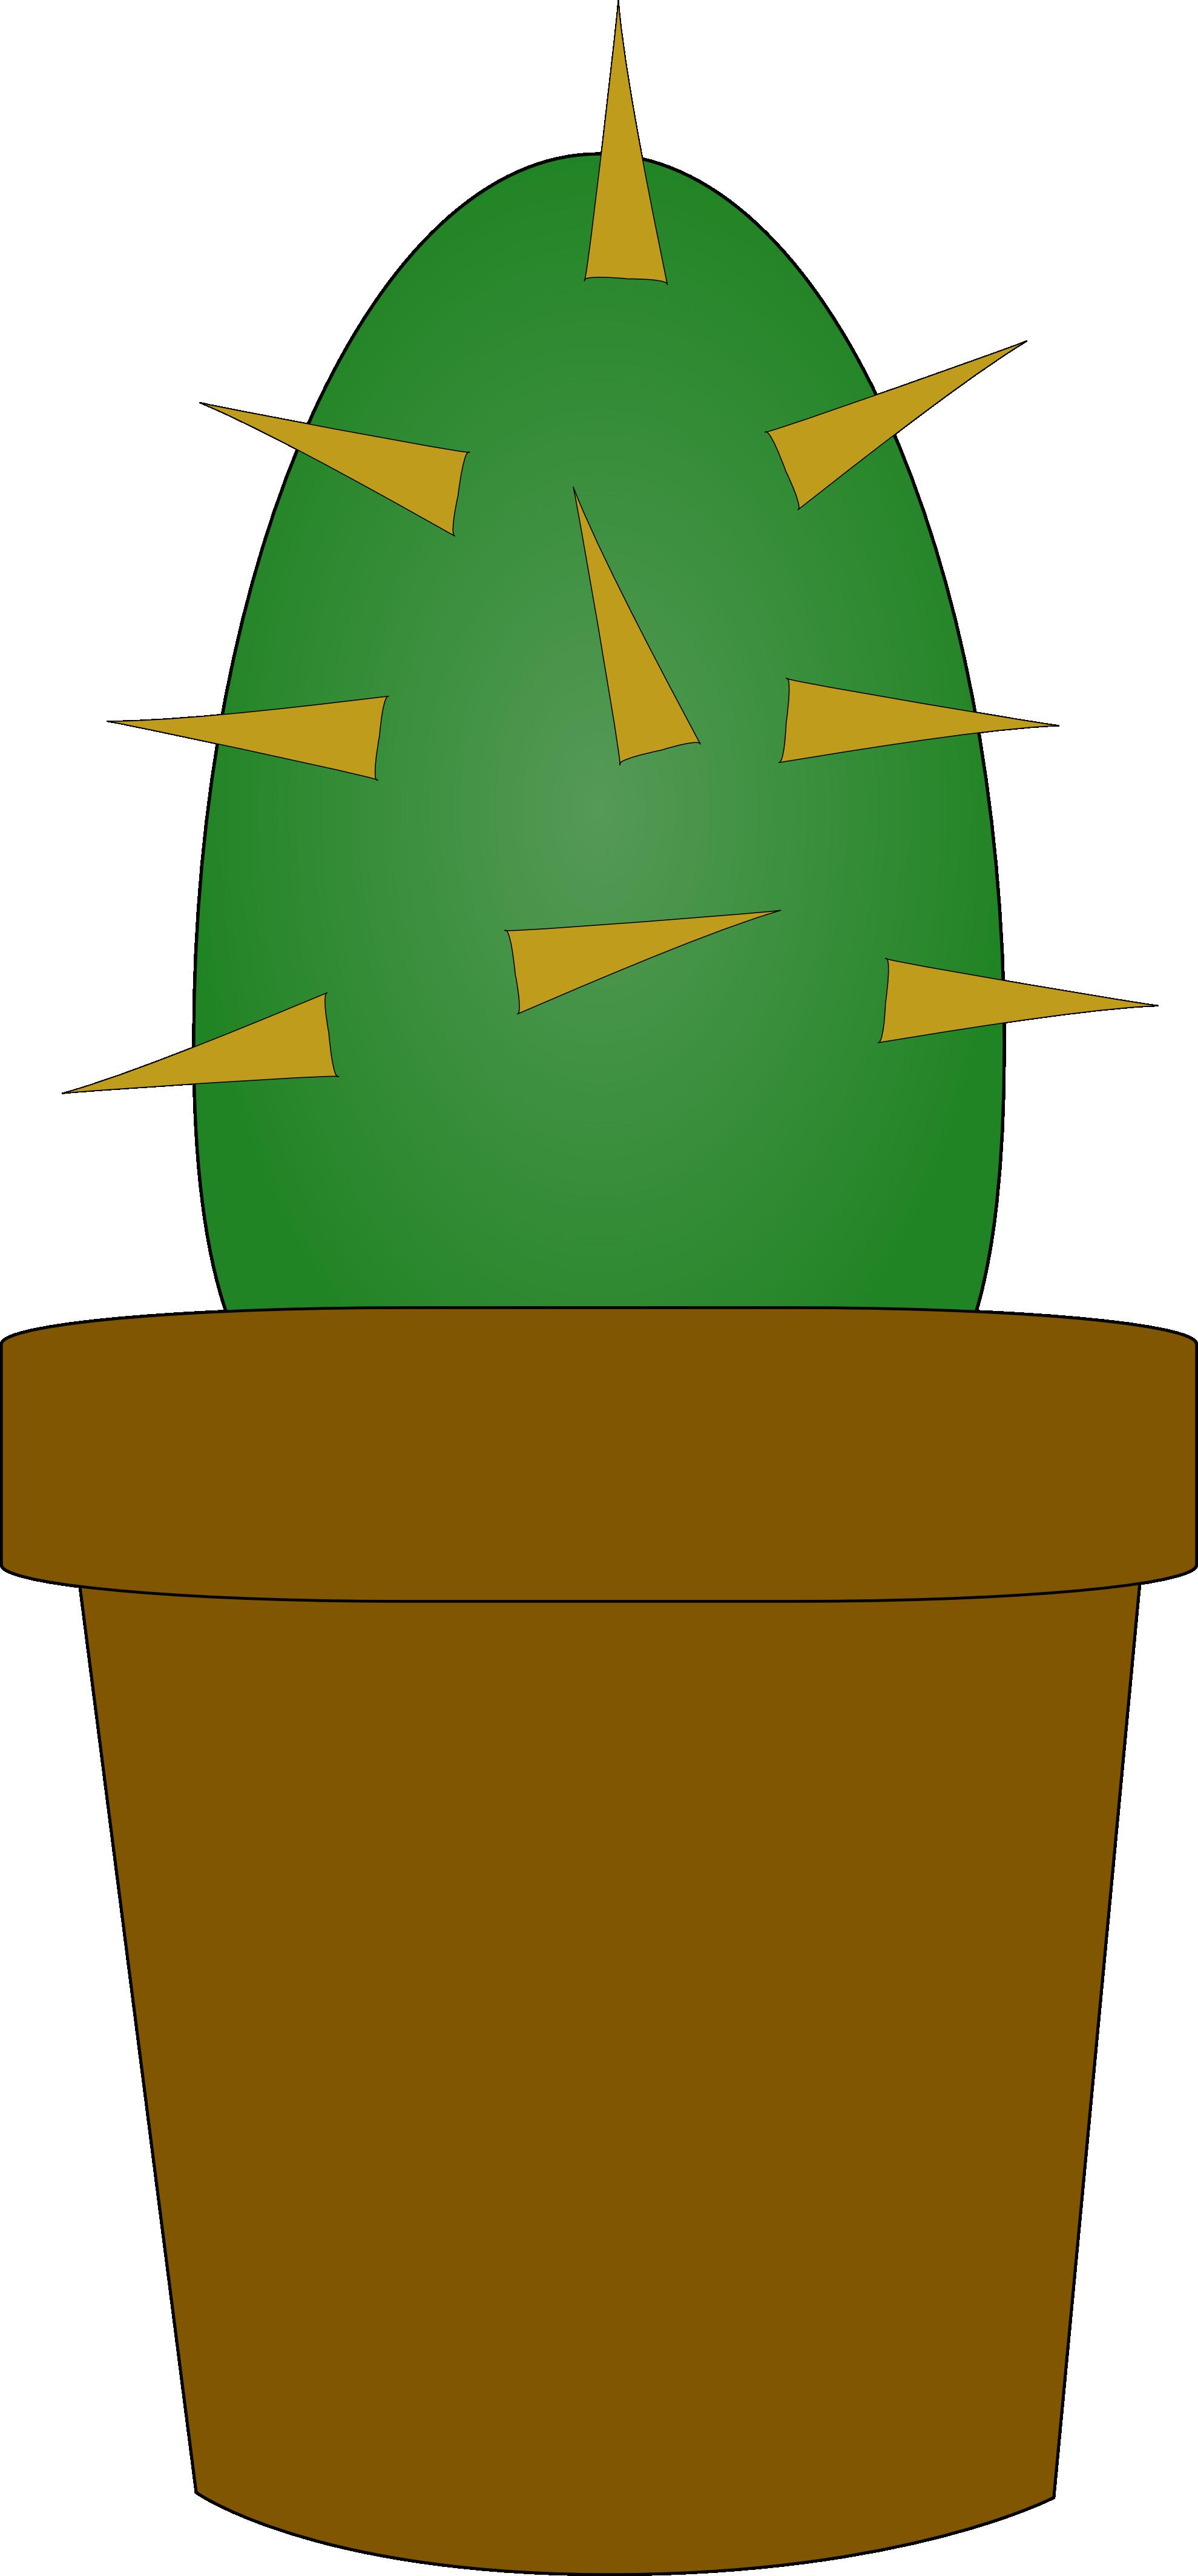 Cactus flower clipart picture free stock clipartist.net » Clip Art » cactus super duper SVG picture free stock